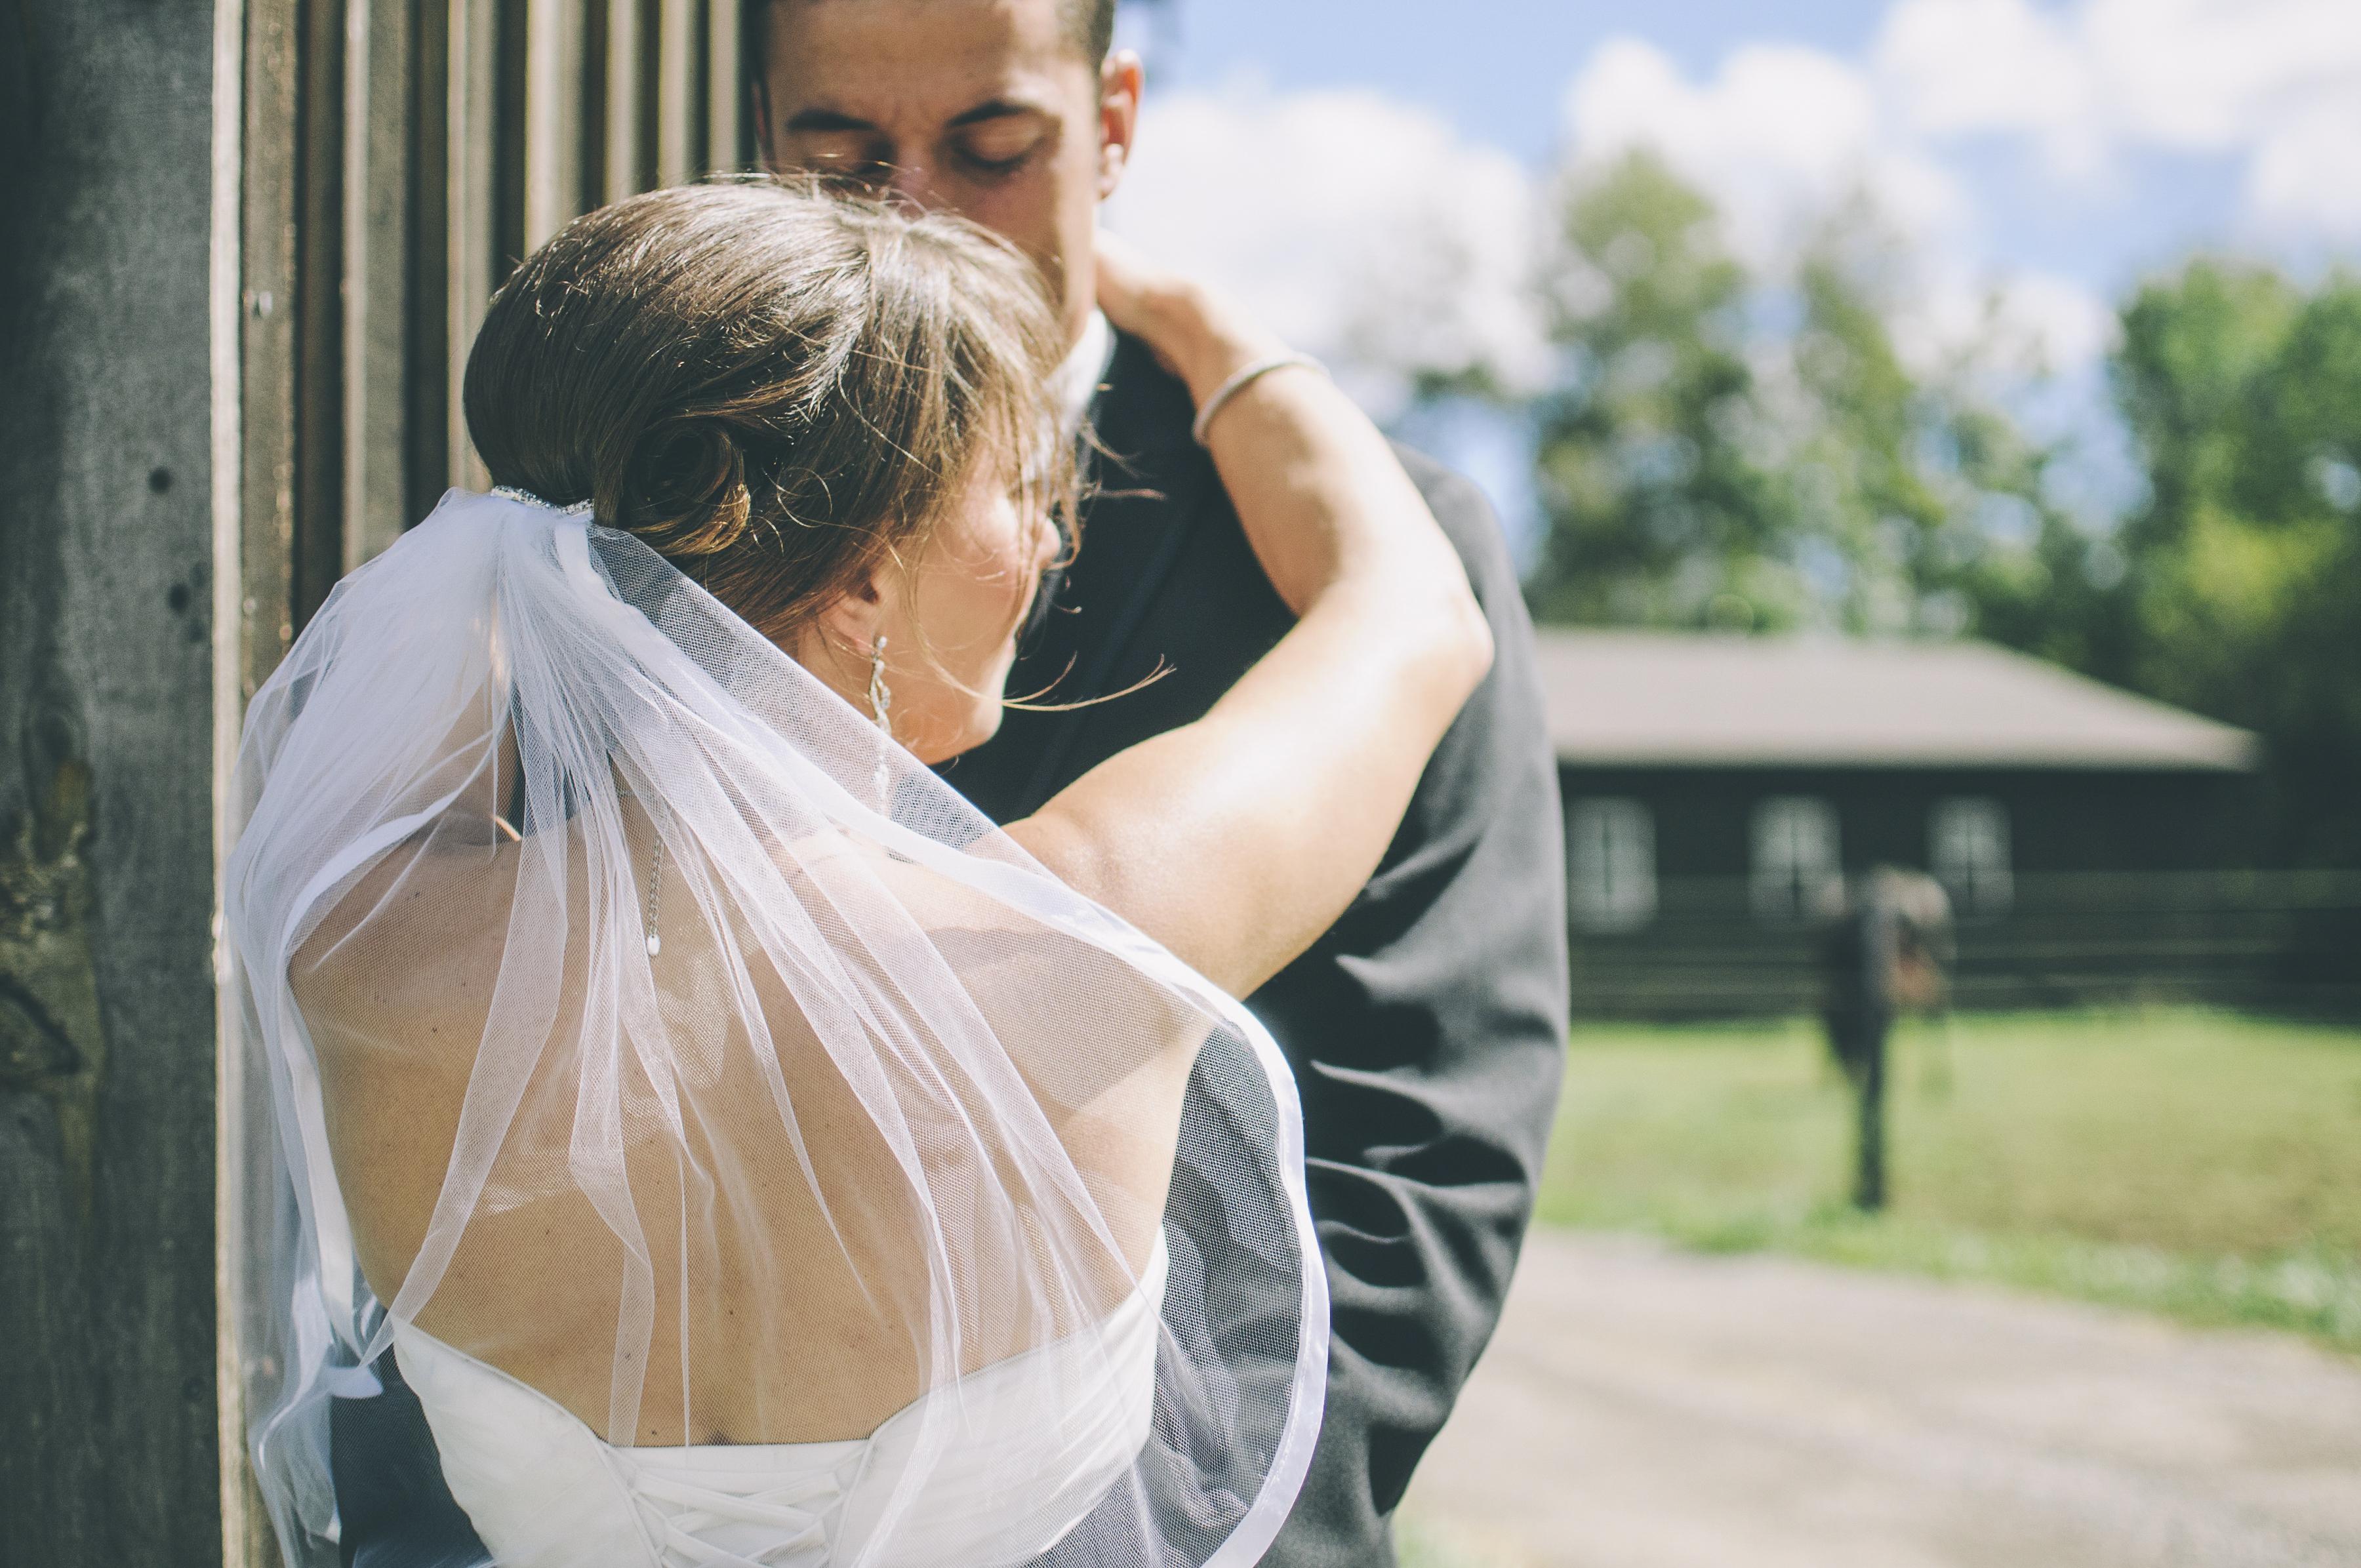 https://sleeklens.com/wp-content/uploads/2018/09/wedding-lightroom-presets-signature-bride-groom-before-1.jpg